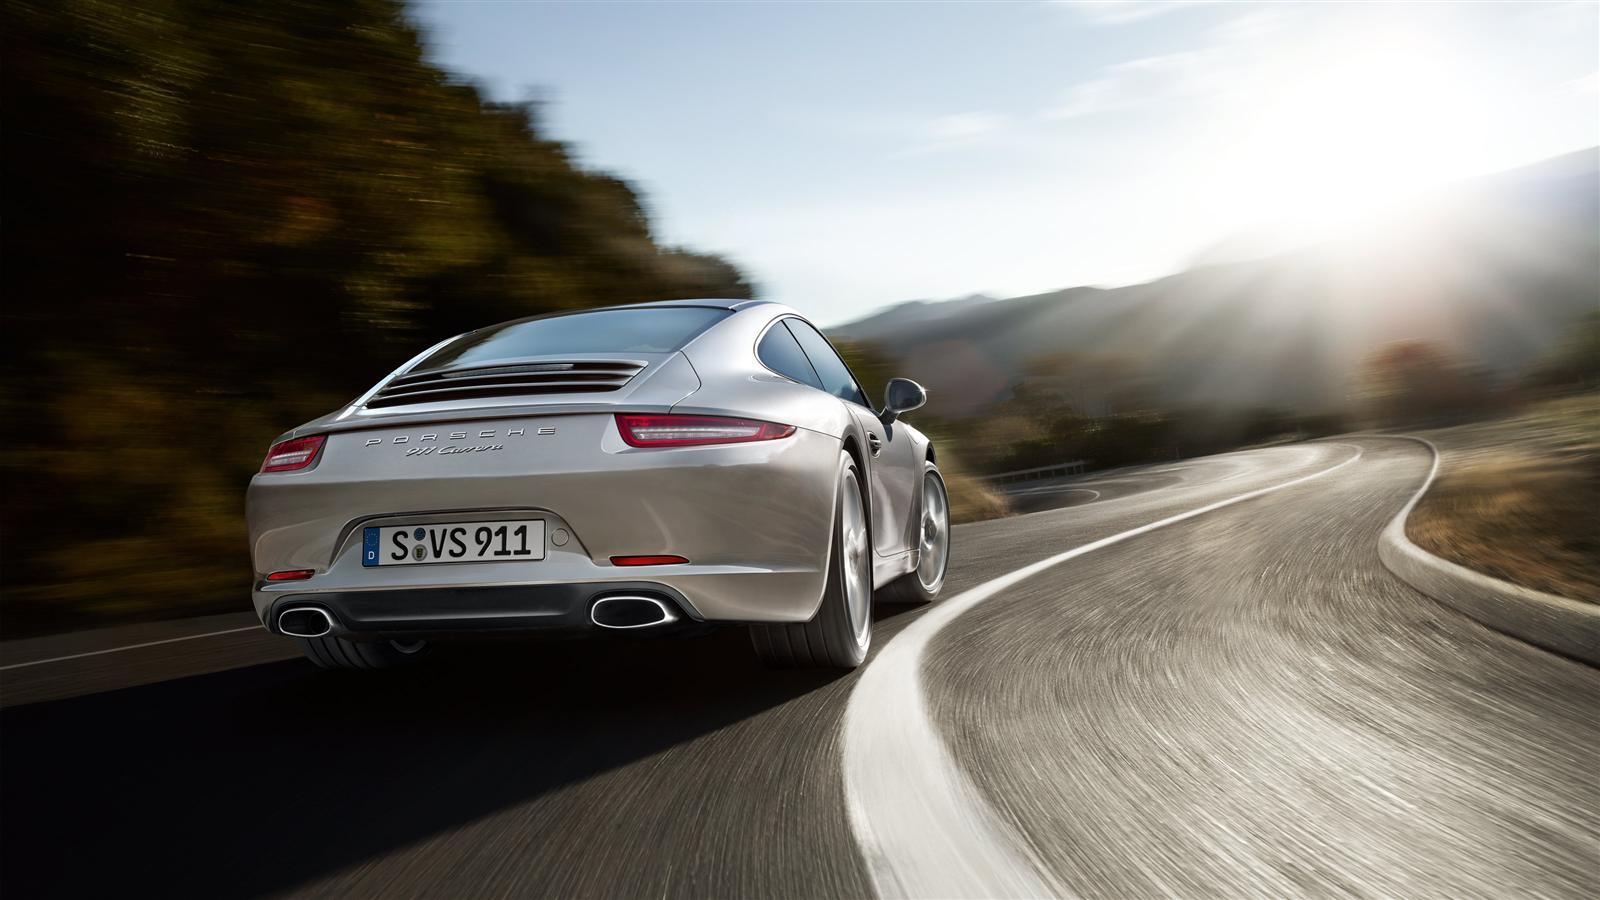 Porsche 911 Carrera /usite/1132/images/911_gal5.jpg